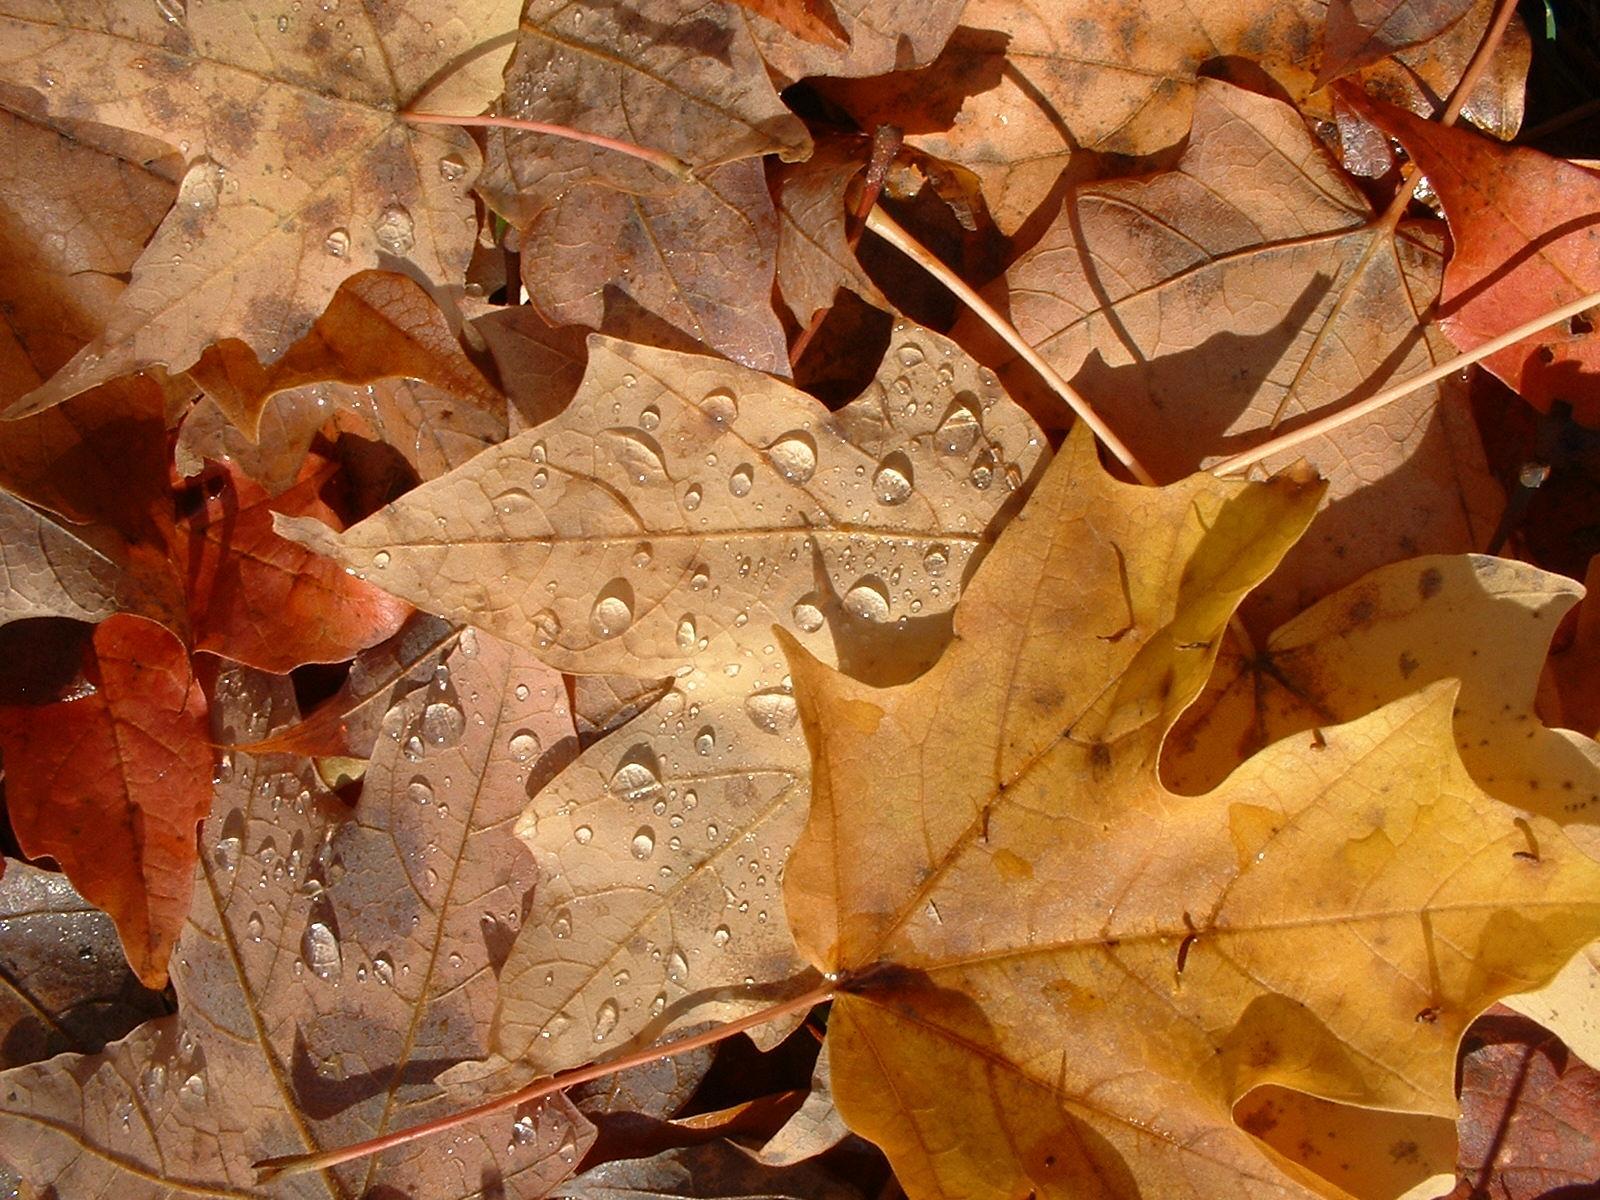 http://4.bp.blogspot.com/_ZueG3OvW8_k/TIwASGsRViI/AAAAAAAADXo/_UzI0g-hun0/s1600/FL_autumn_leaves.jpg